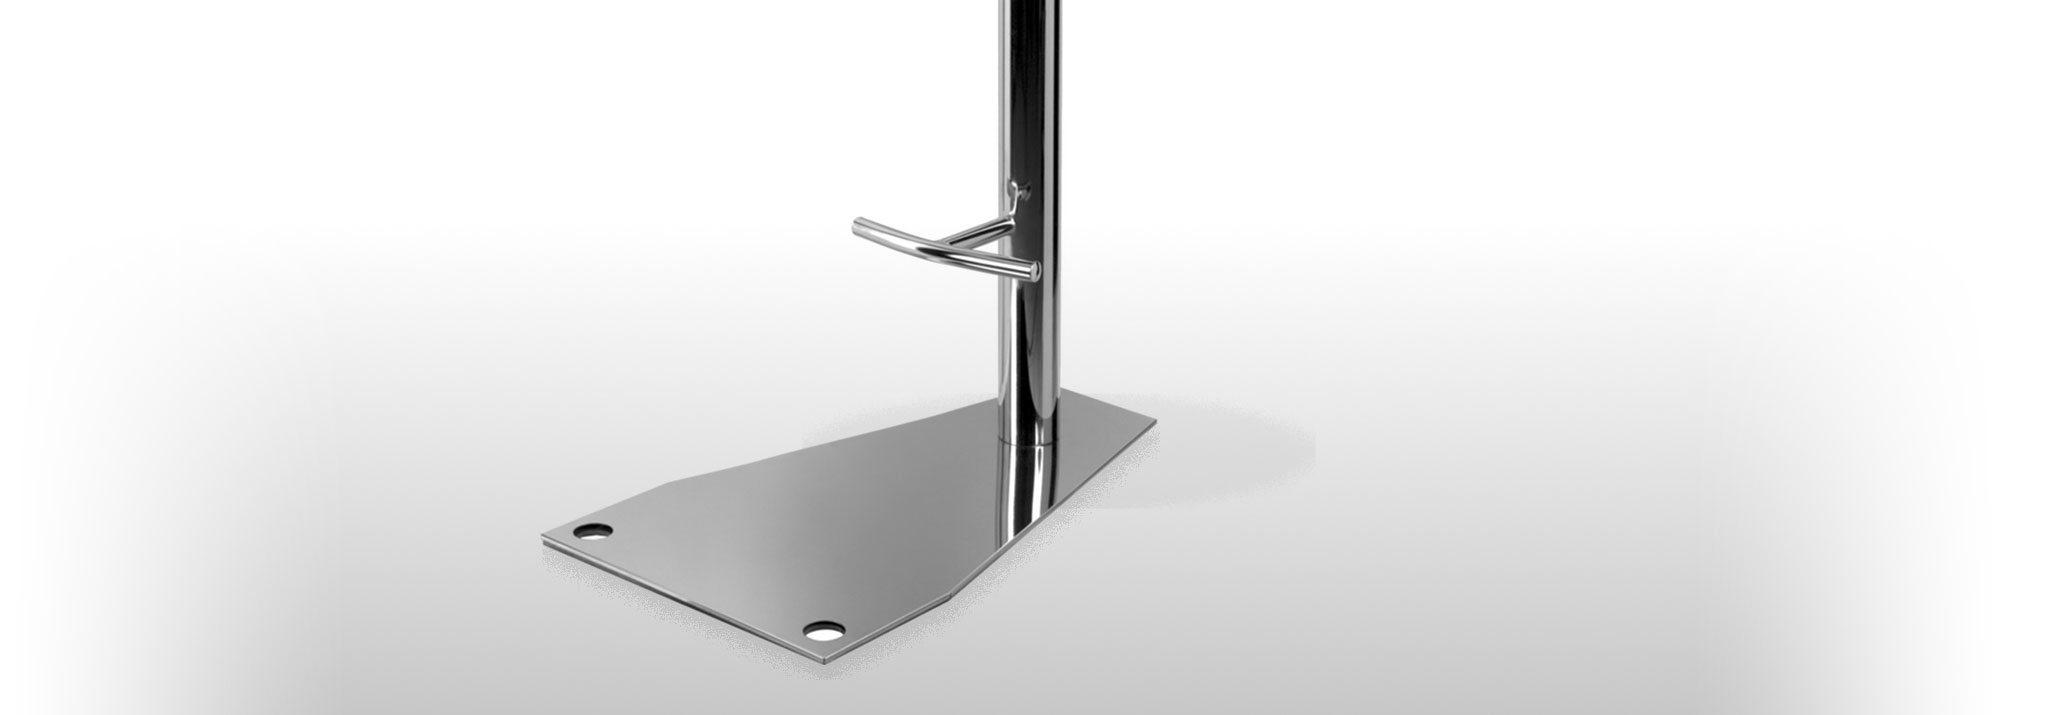 Sgabello ergonomico san marco design - Sgabello ergonomico ikea ...